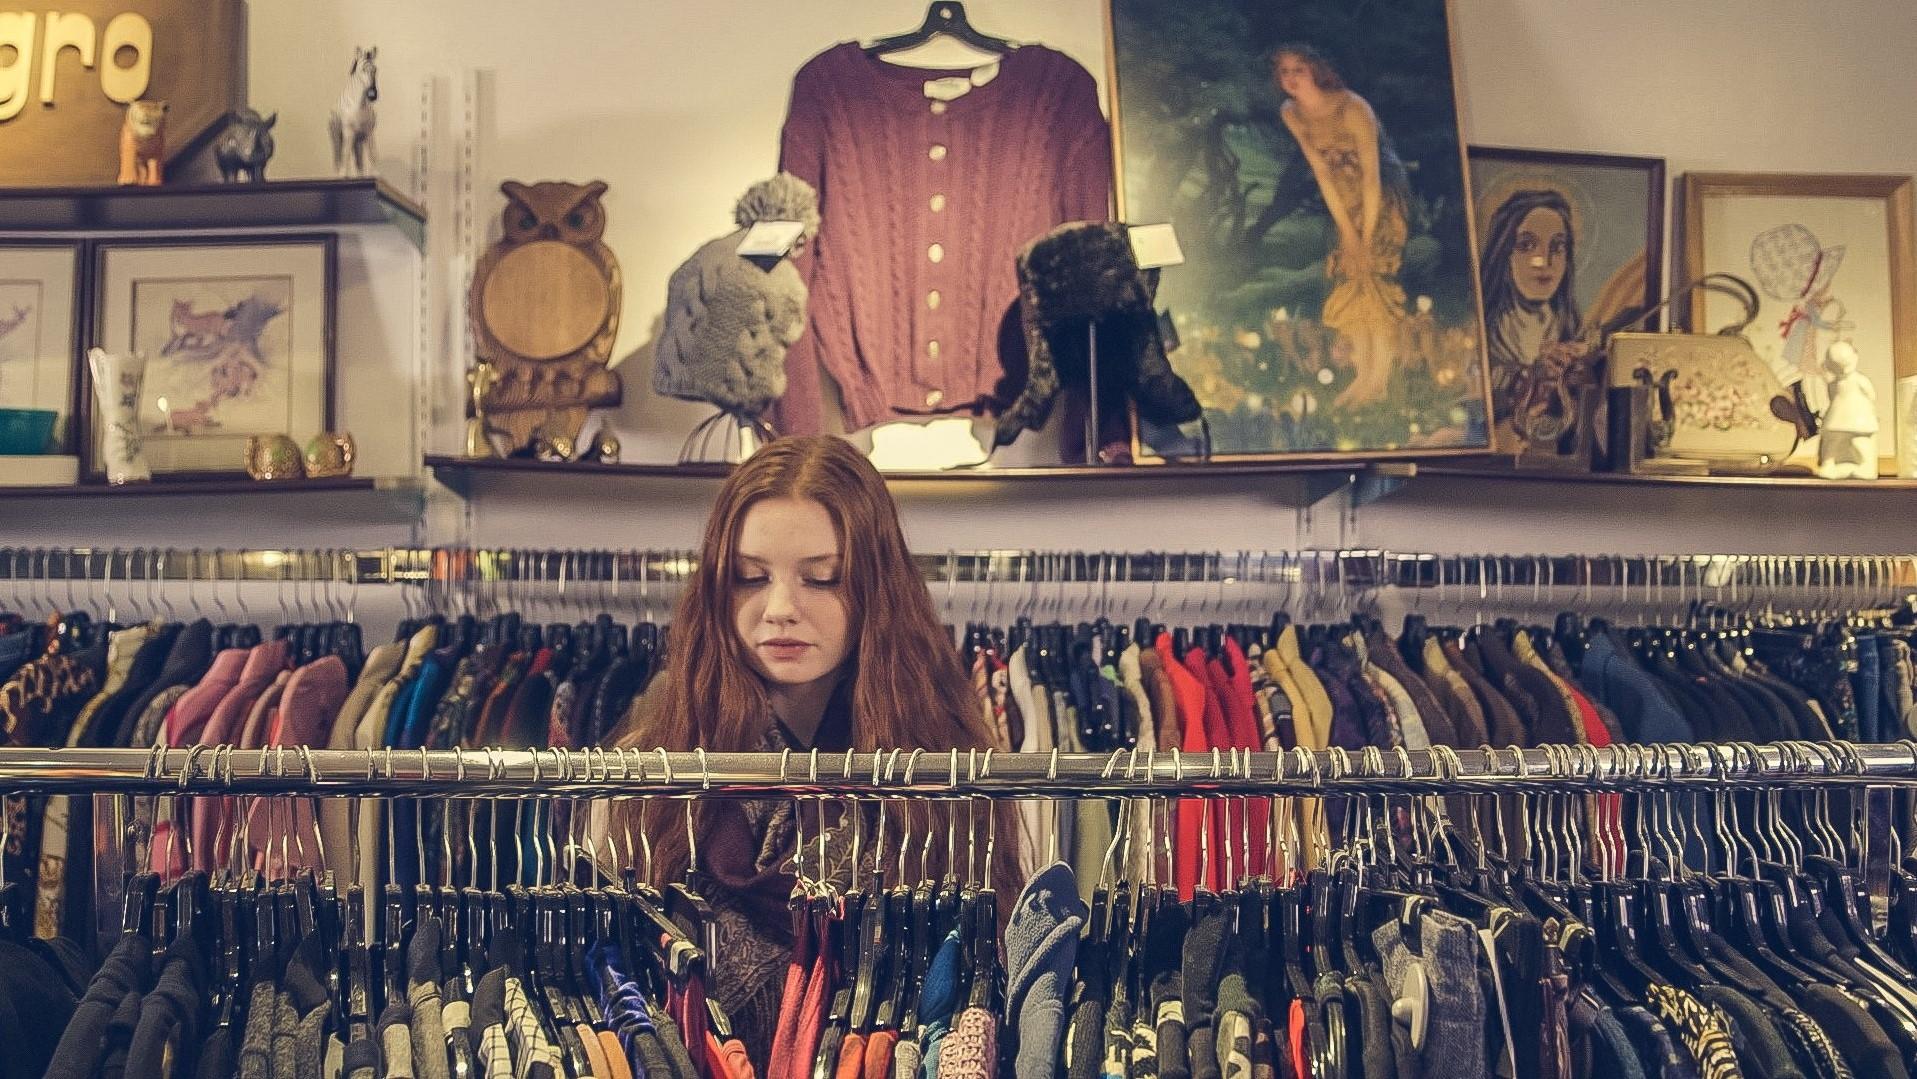 Image: woman sifting through clothing racks at a vintage clothing store